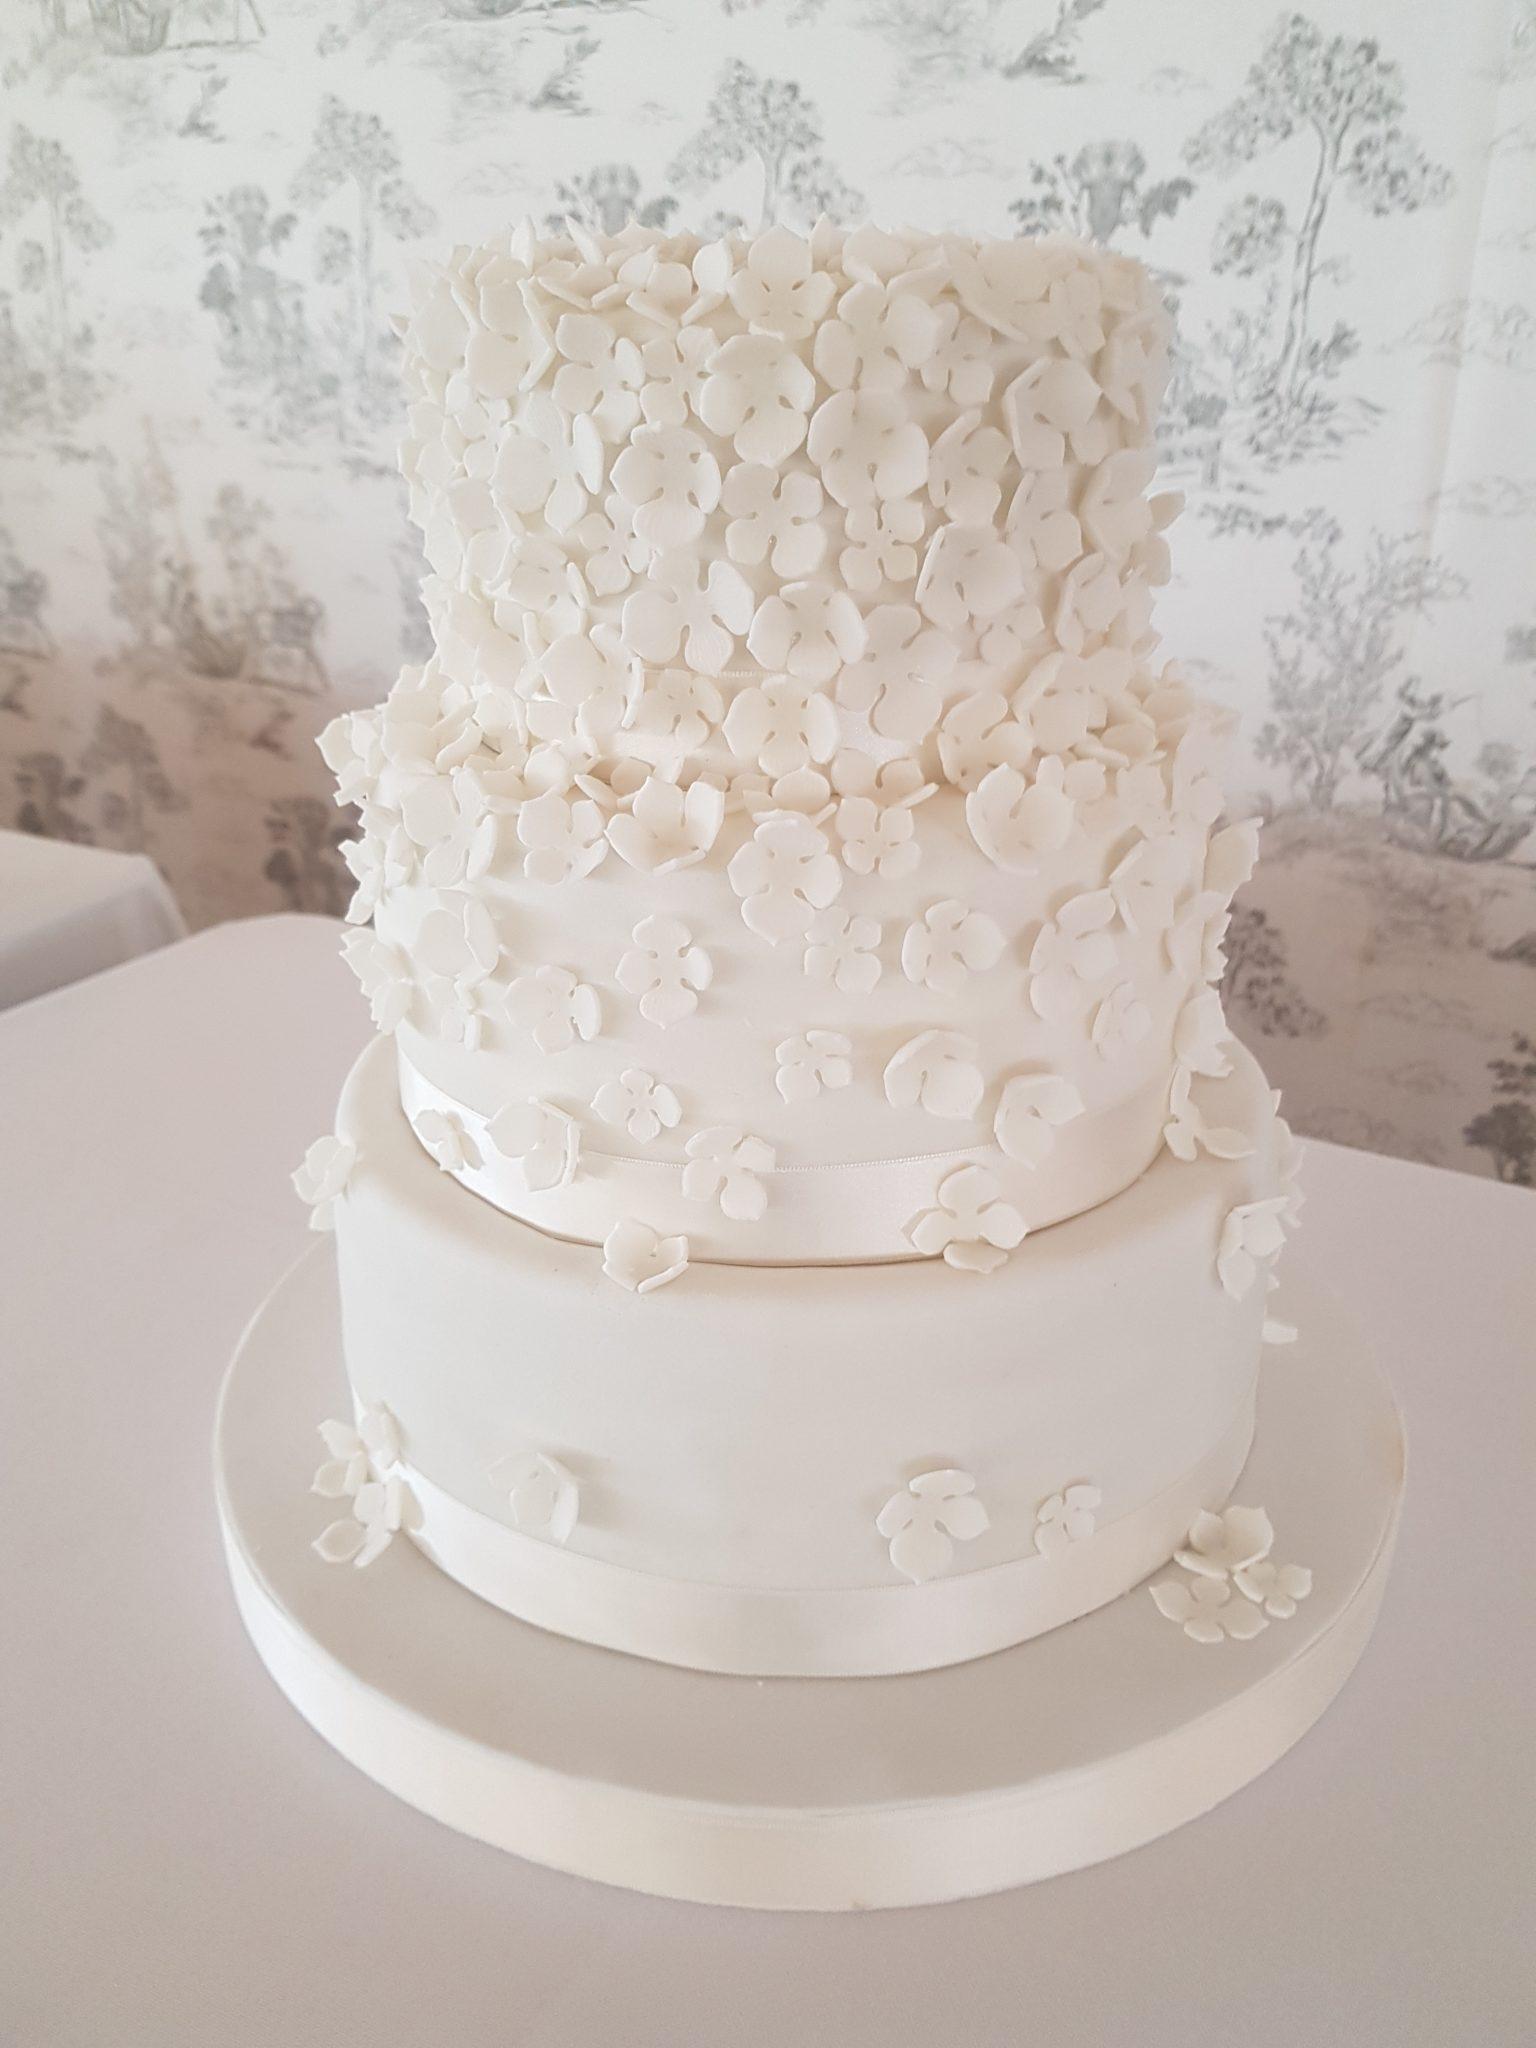 las mejores tartas de boda en sevilla. wedding cakes Seville